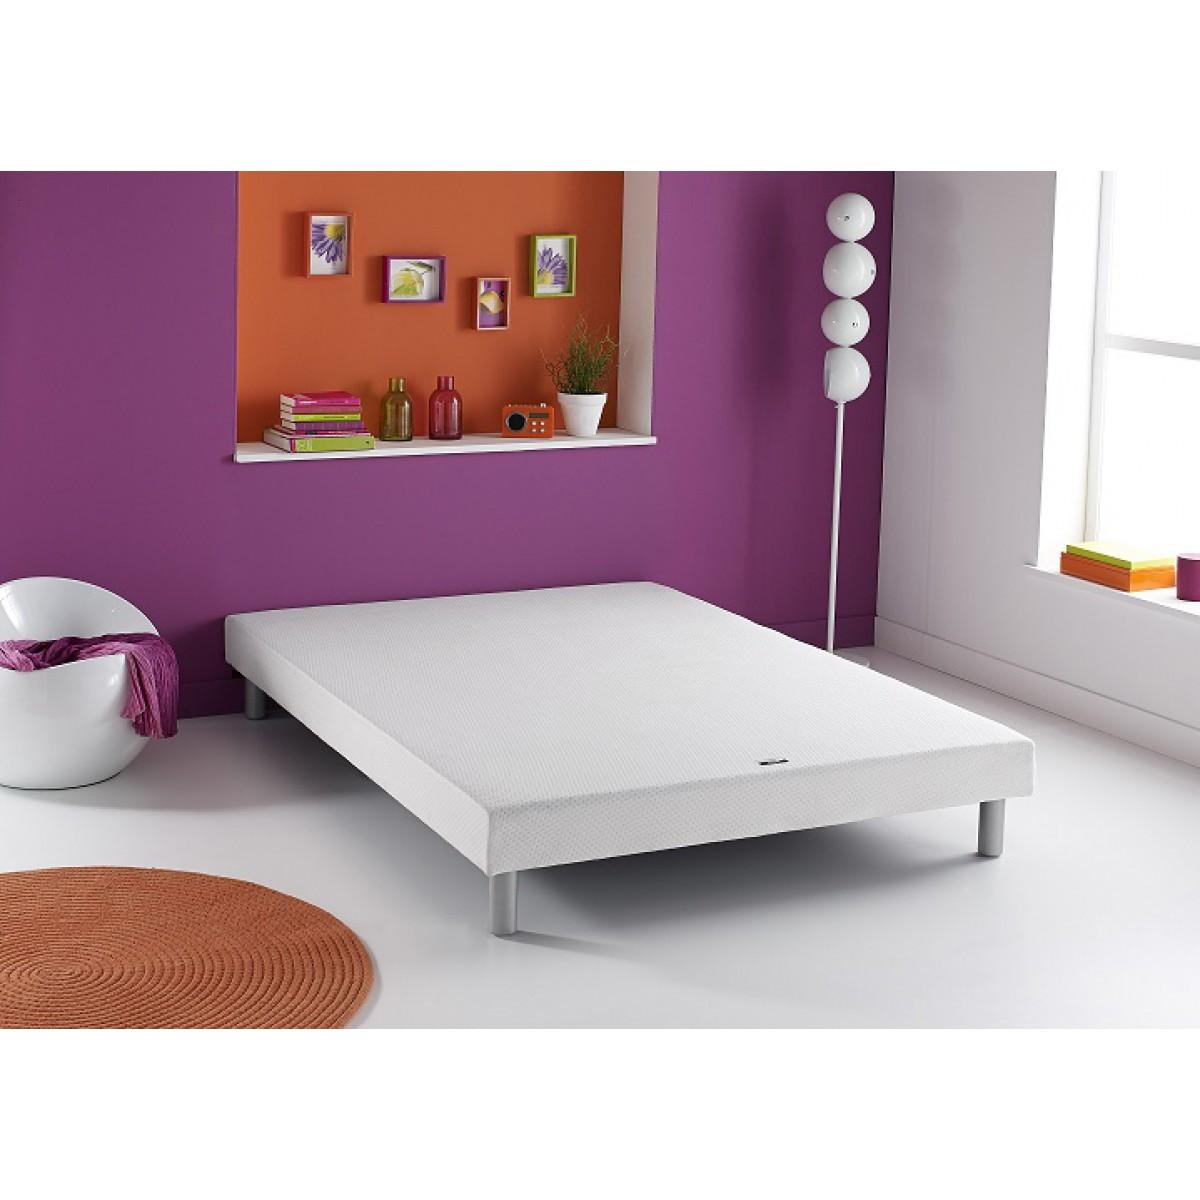 dunlopillo csommier dunlosum pieds 90x200. Black Bedroom Furniture Sets. Home Design Ideas